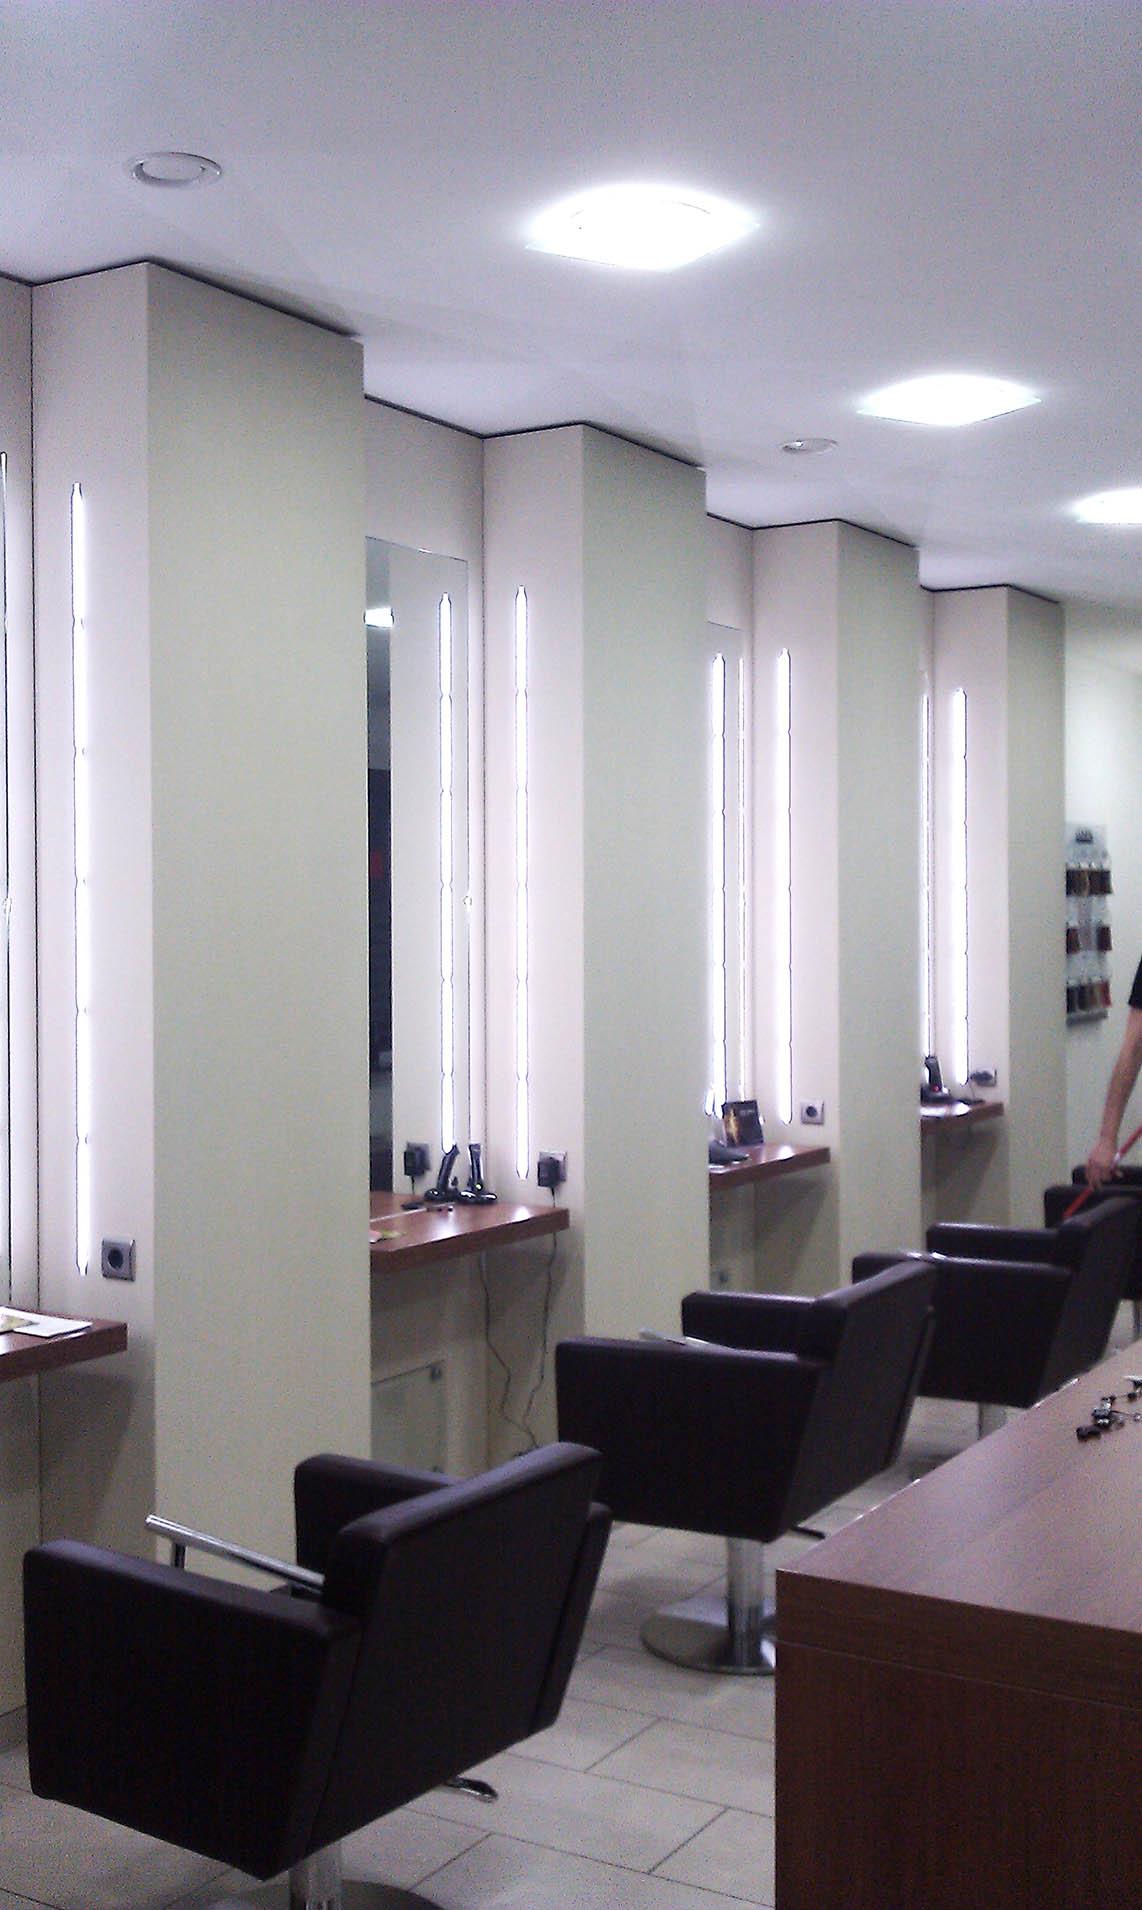 Ladeneinrichtung - Friseurladen